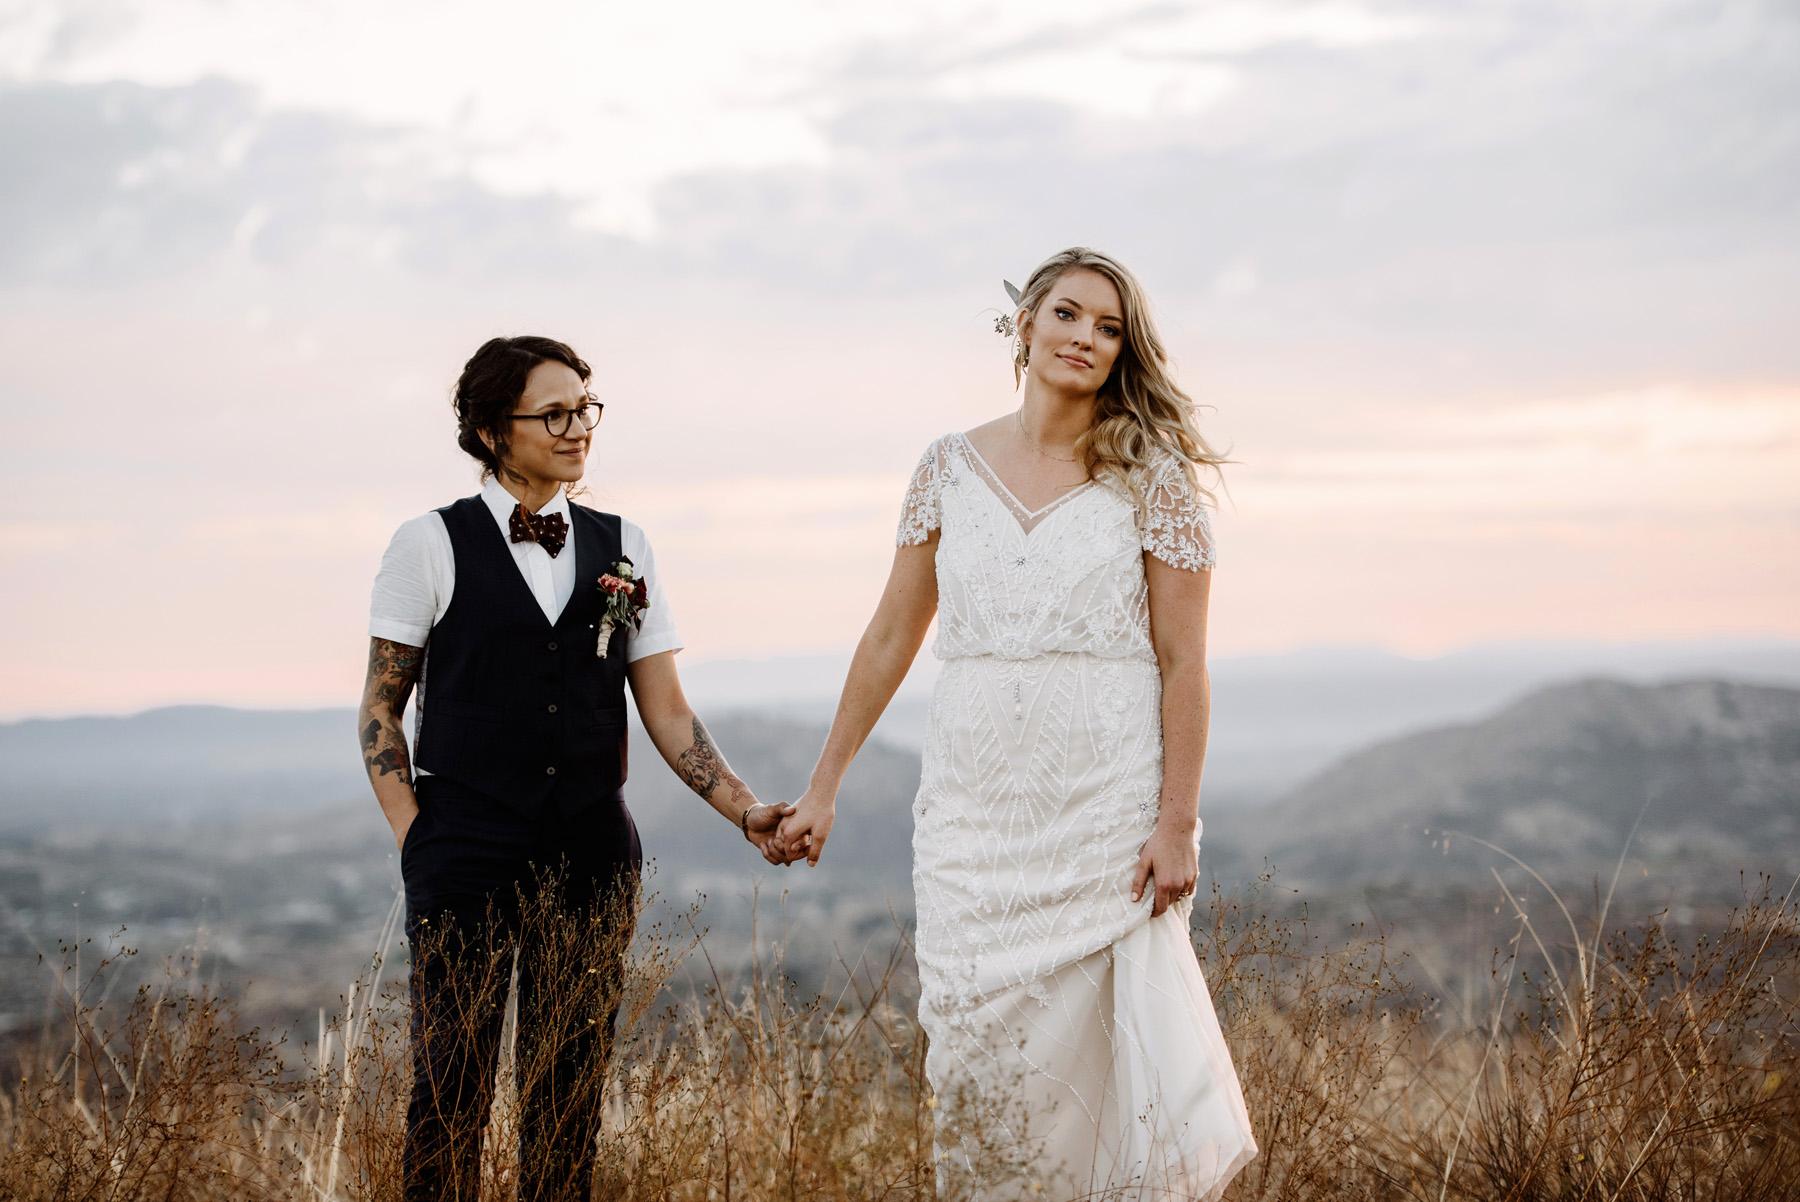 Wedding  | Courtney + Amber | Temecula, CA